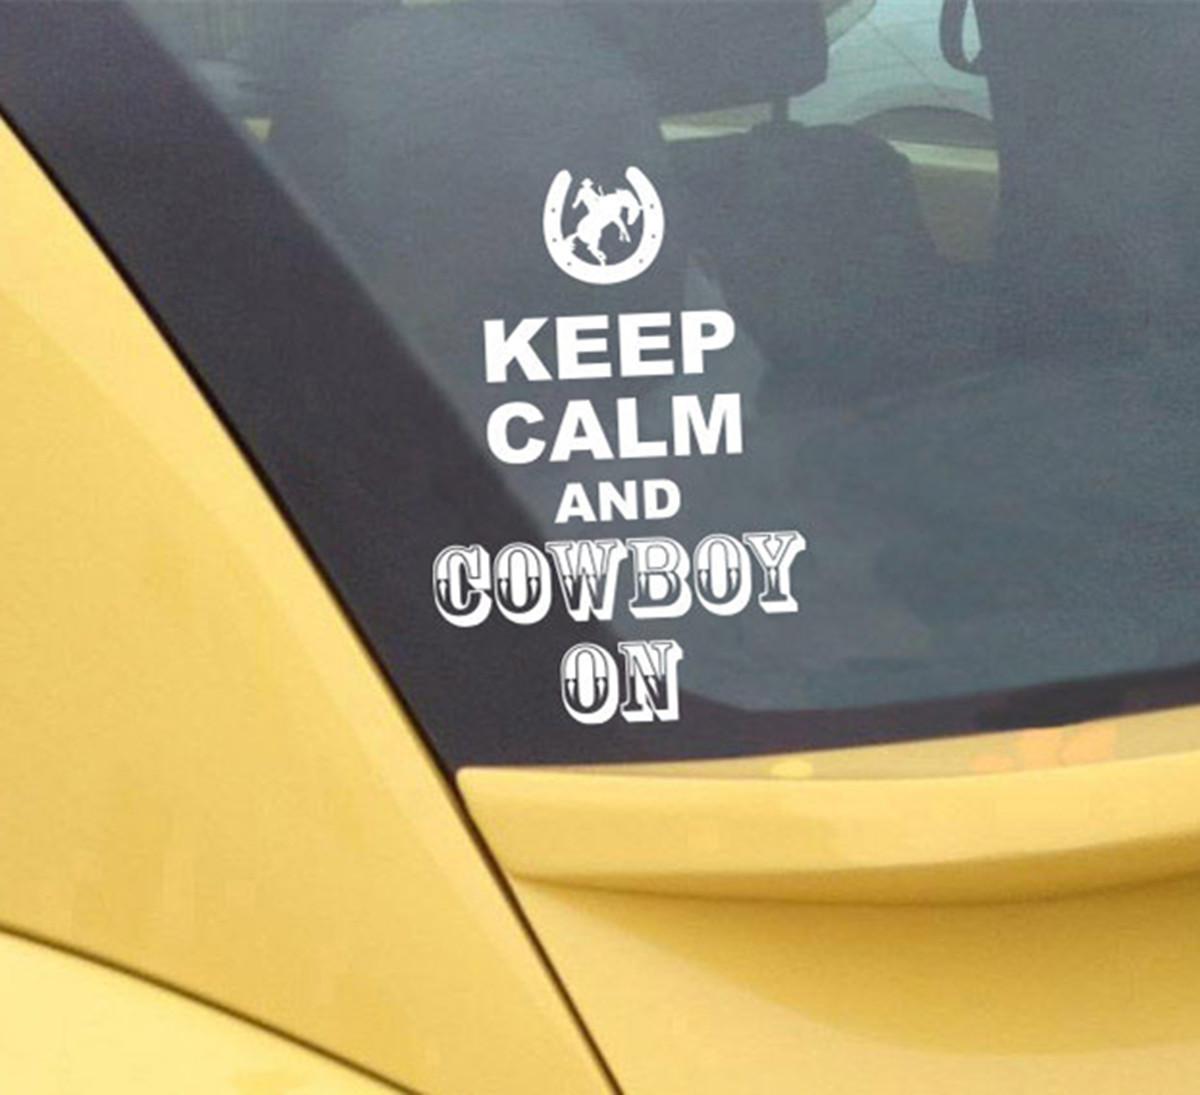 KEEP CALM Pattern Car Window Wall Bumper Vinyl Sticker Decal Decor ...